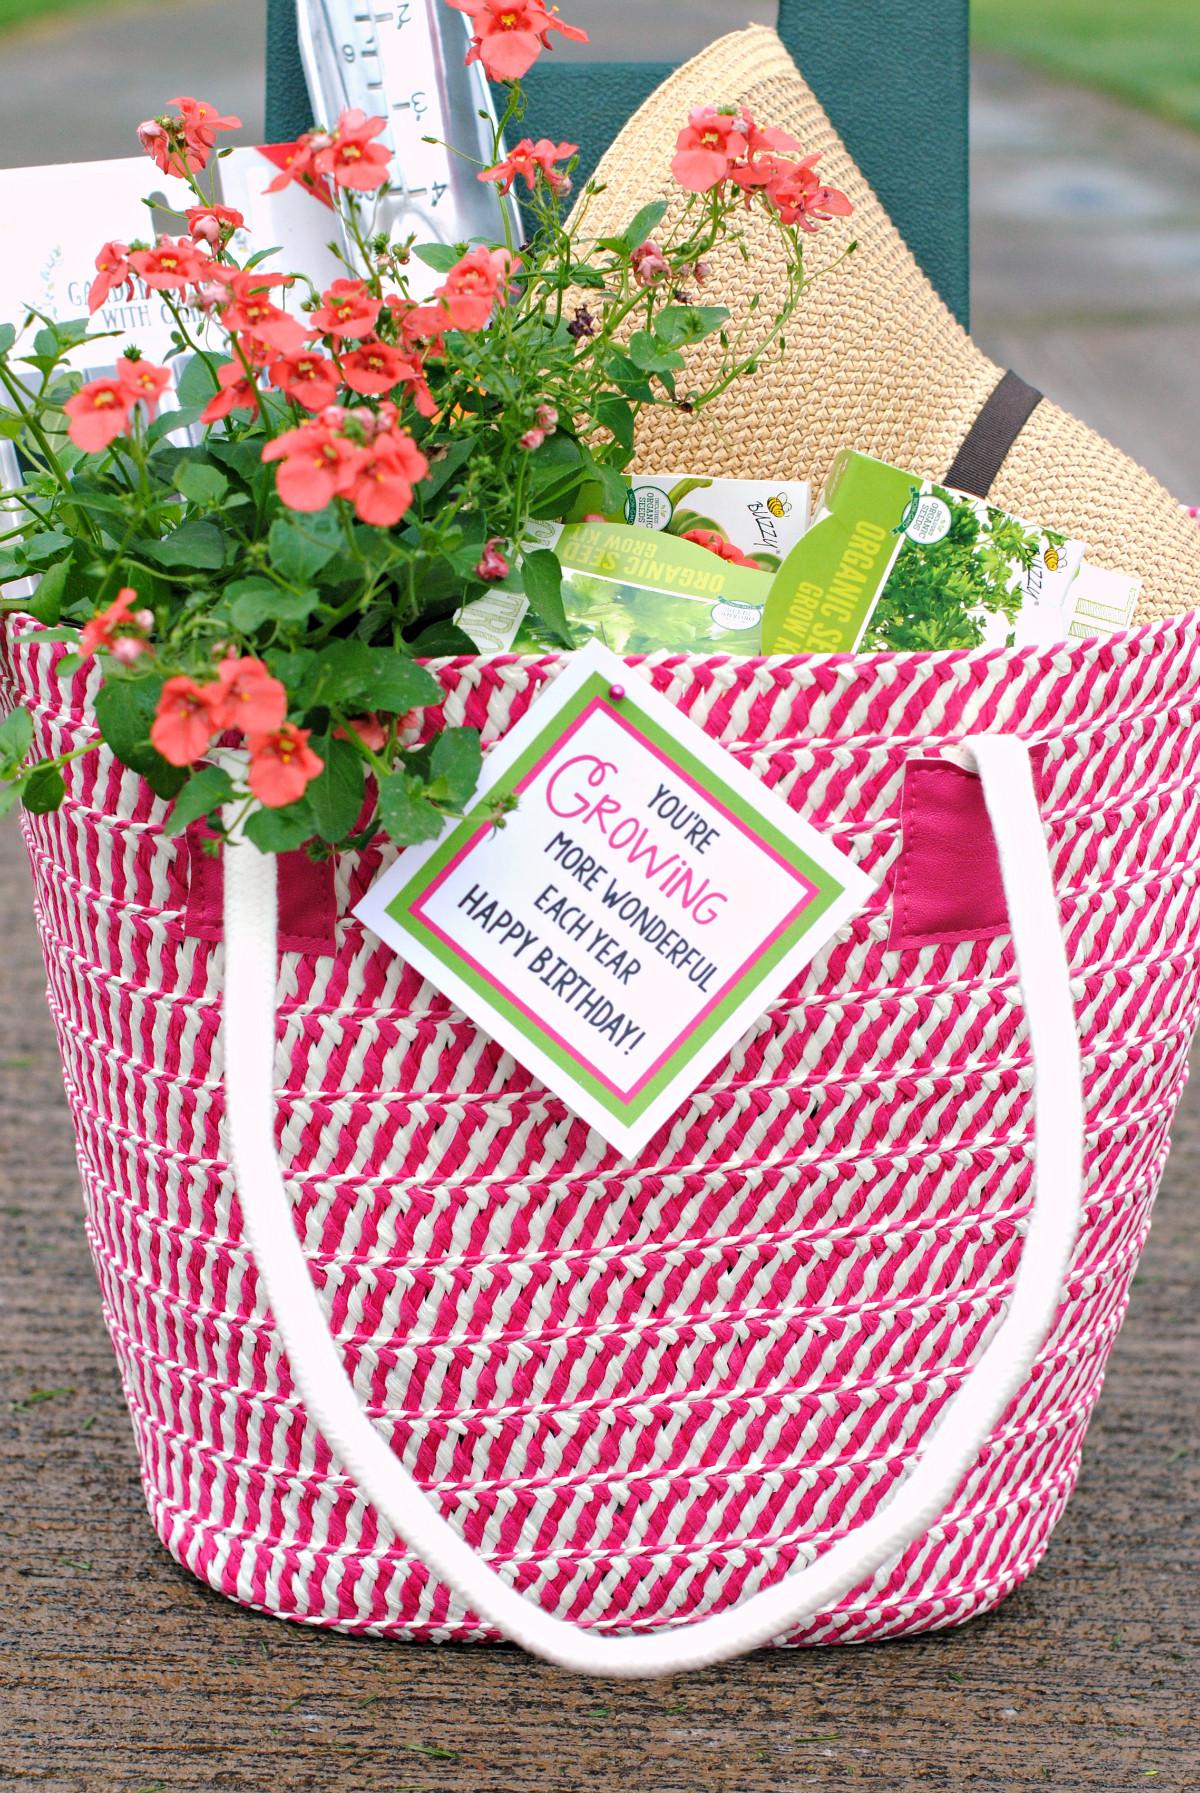 Outdoor Gift Basket Ideas  Fun Gardening Gift Basket Idea – Fun Squared